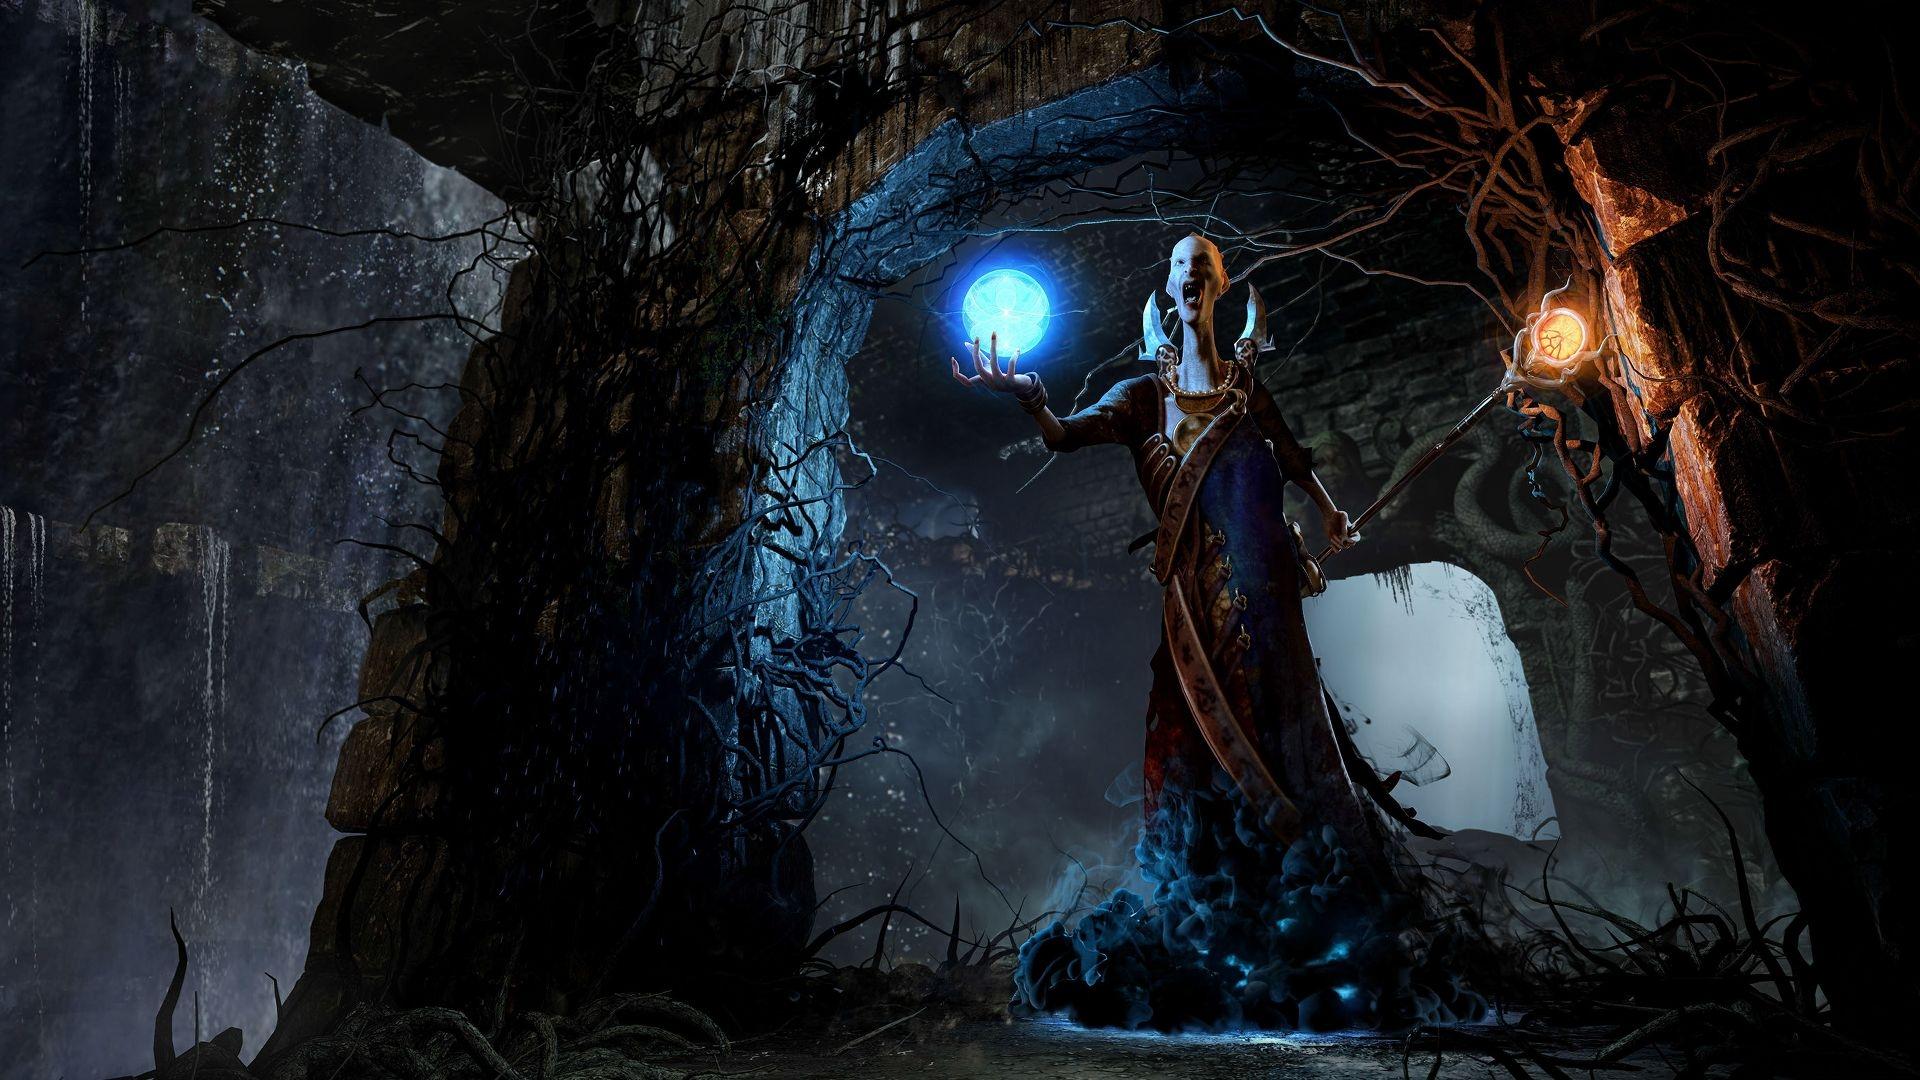 Олдскульная RPG The Bard's Tale 4 вышла в Steam и получила свыше 50 % негативных отзывов